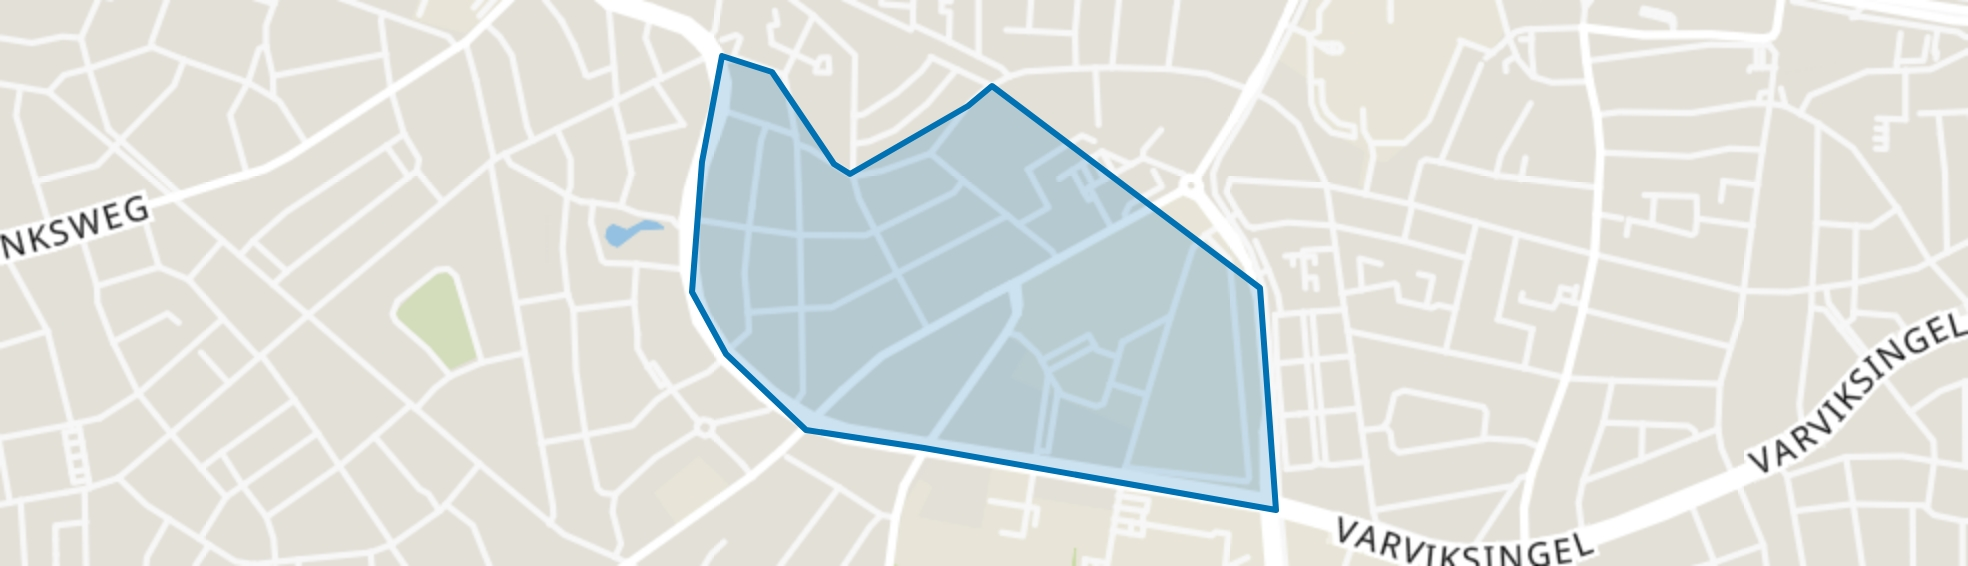 Veldkamp-Getfert-West, Enschede map